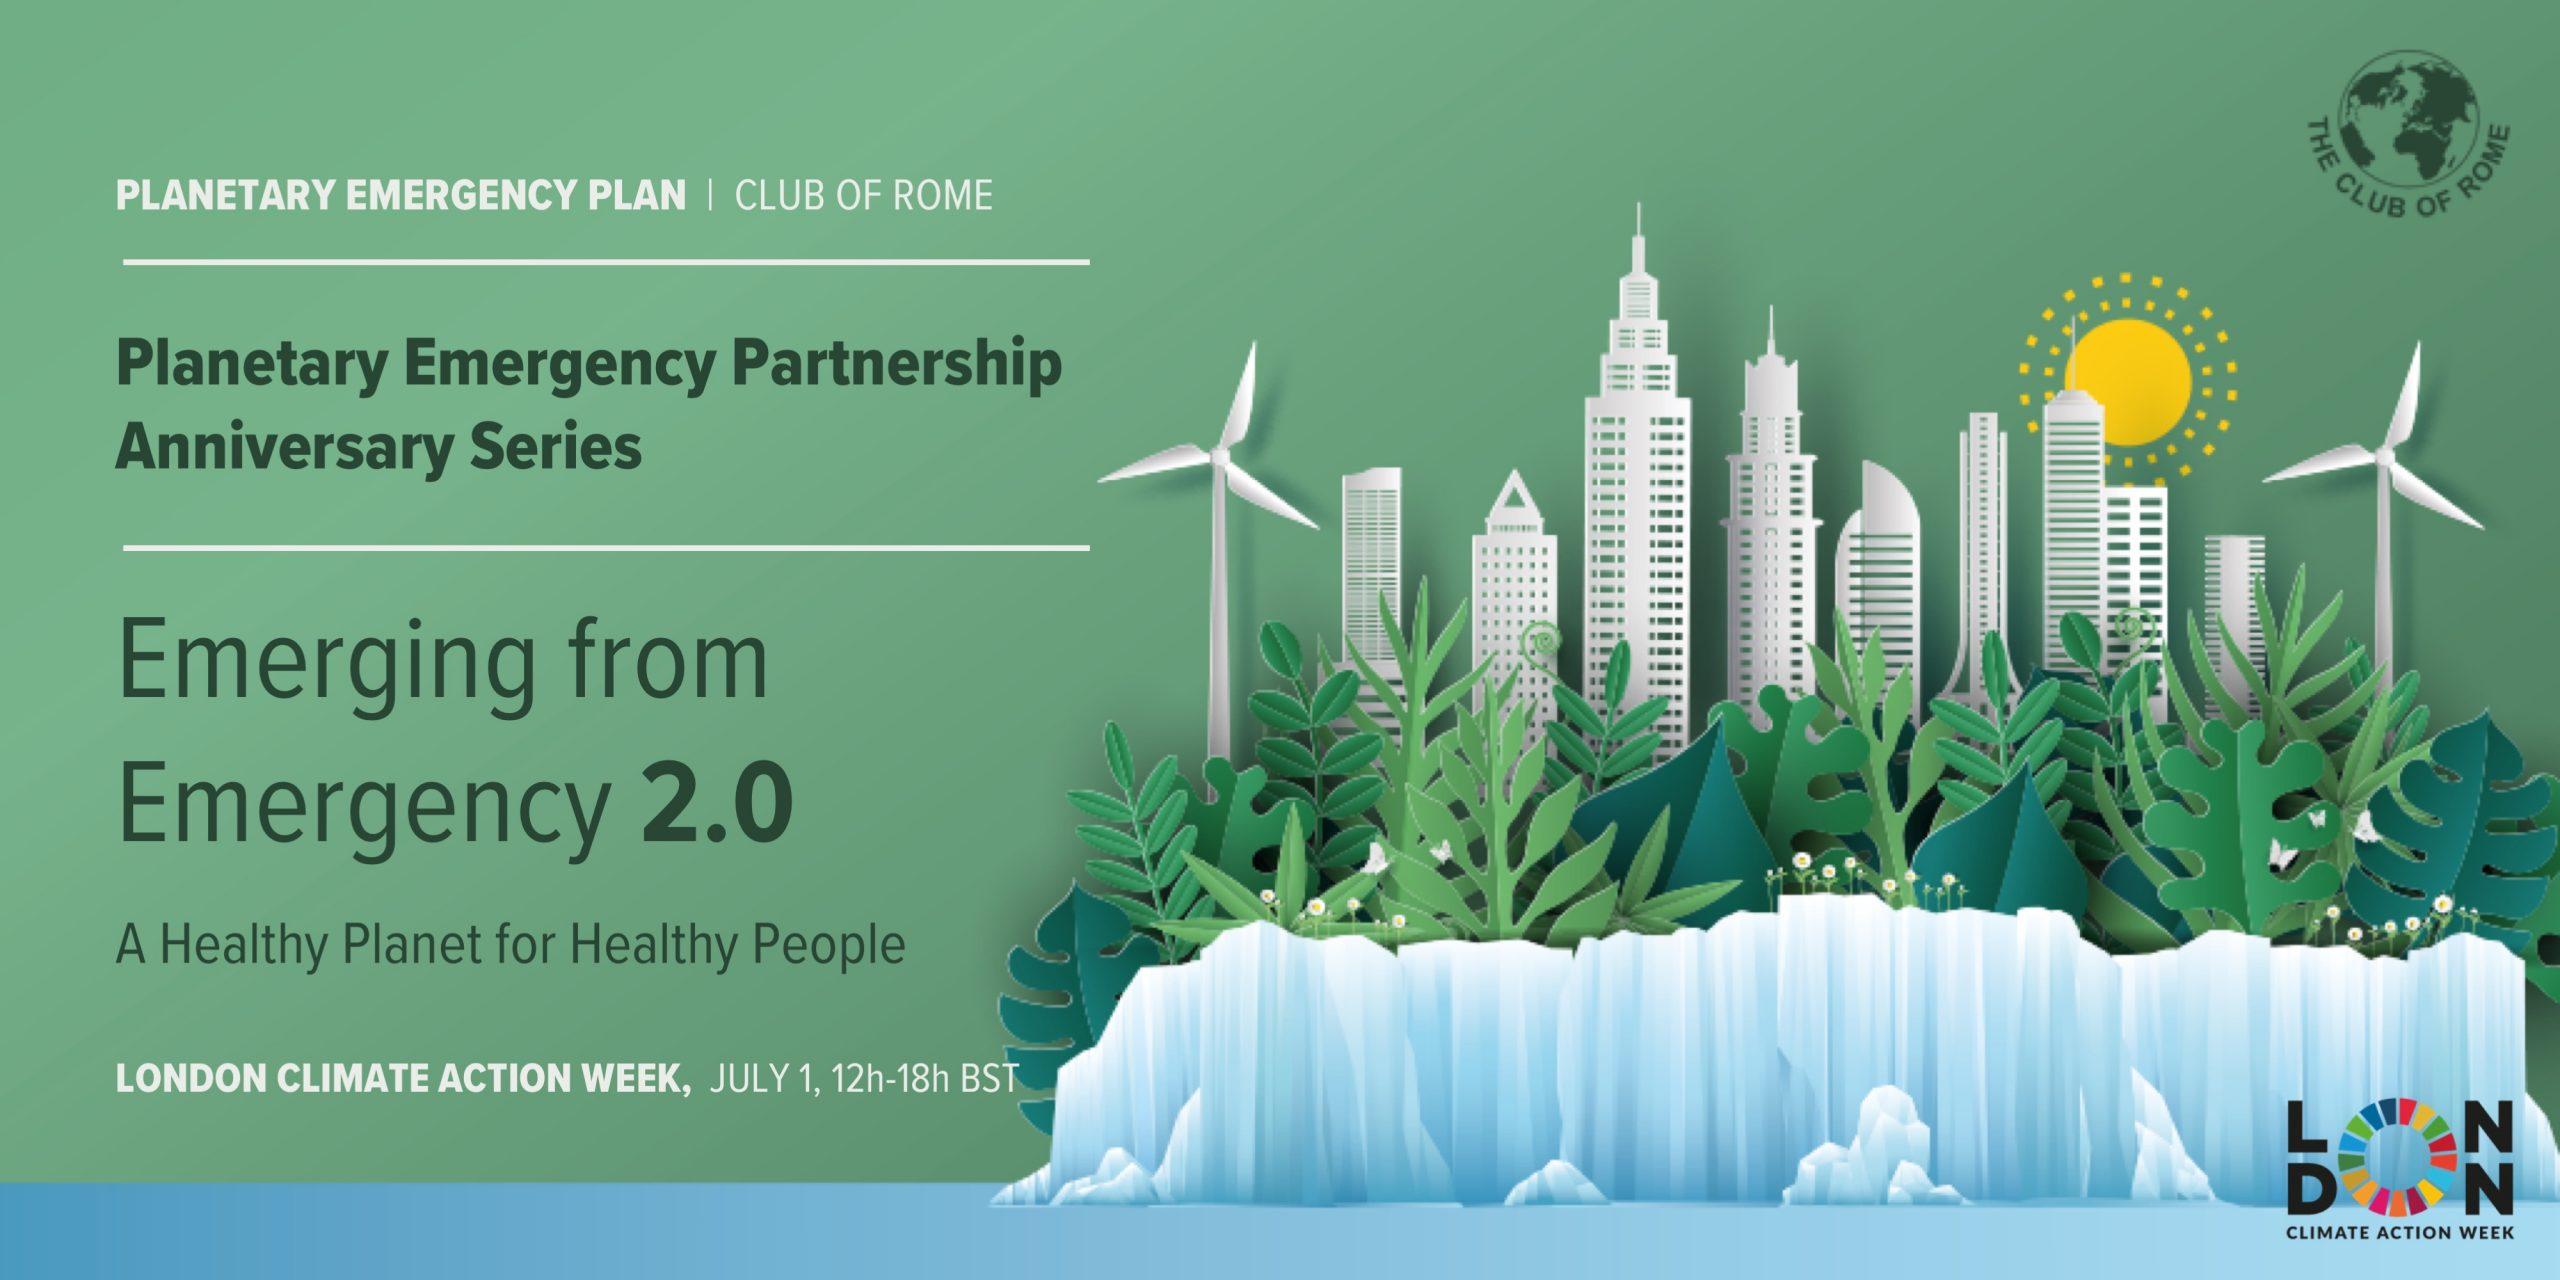 London Climate Action Week: Planetary Emergency Partnership Anniversary Series